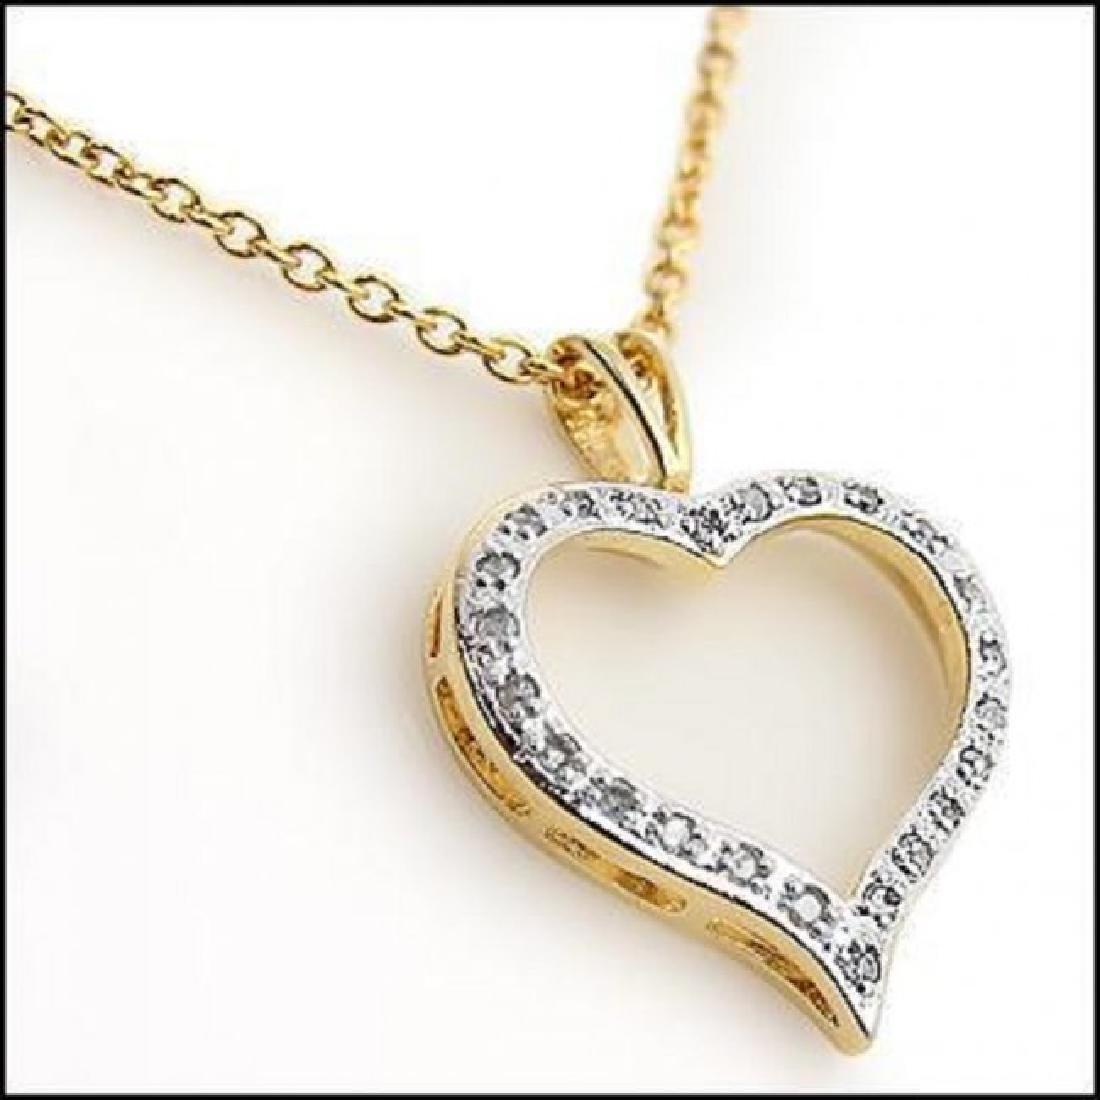 0.46 CT Diamond Heart Designer Necklace $775